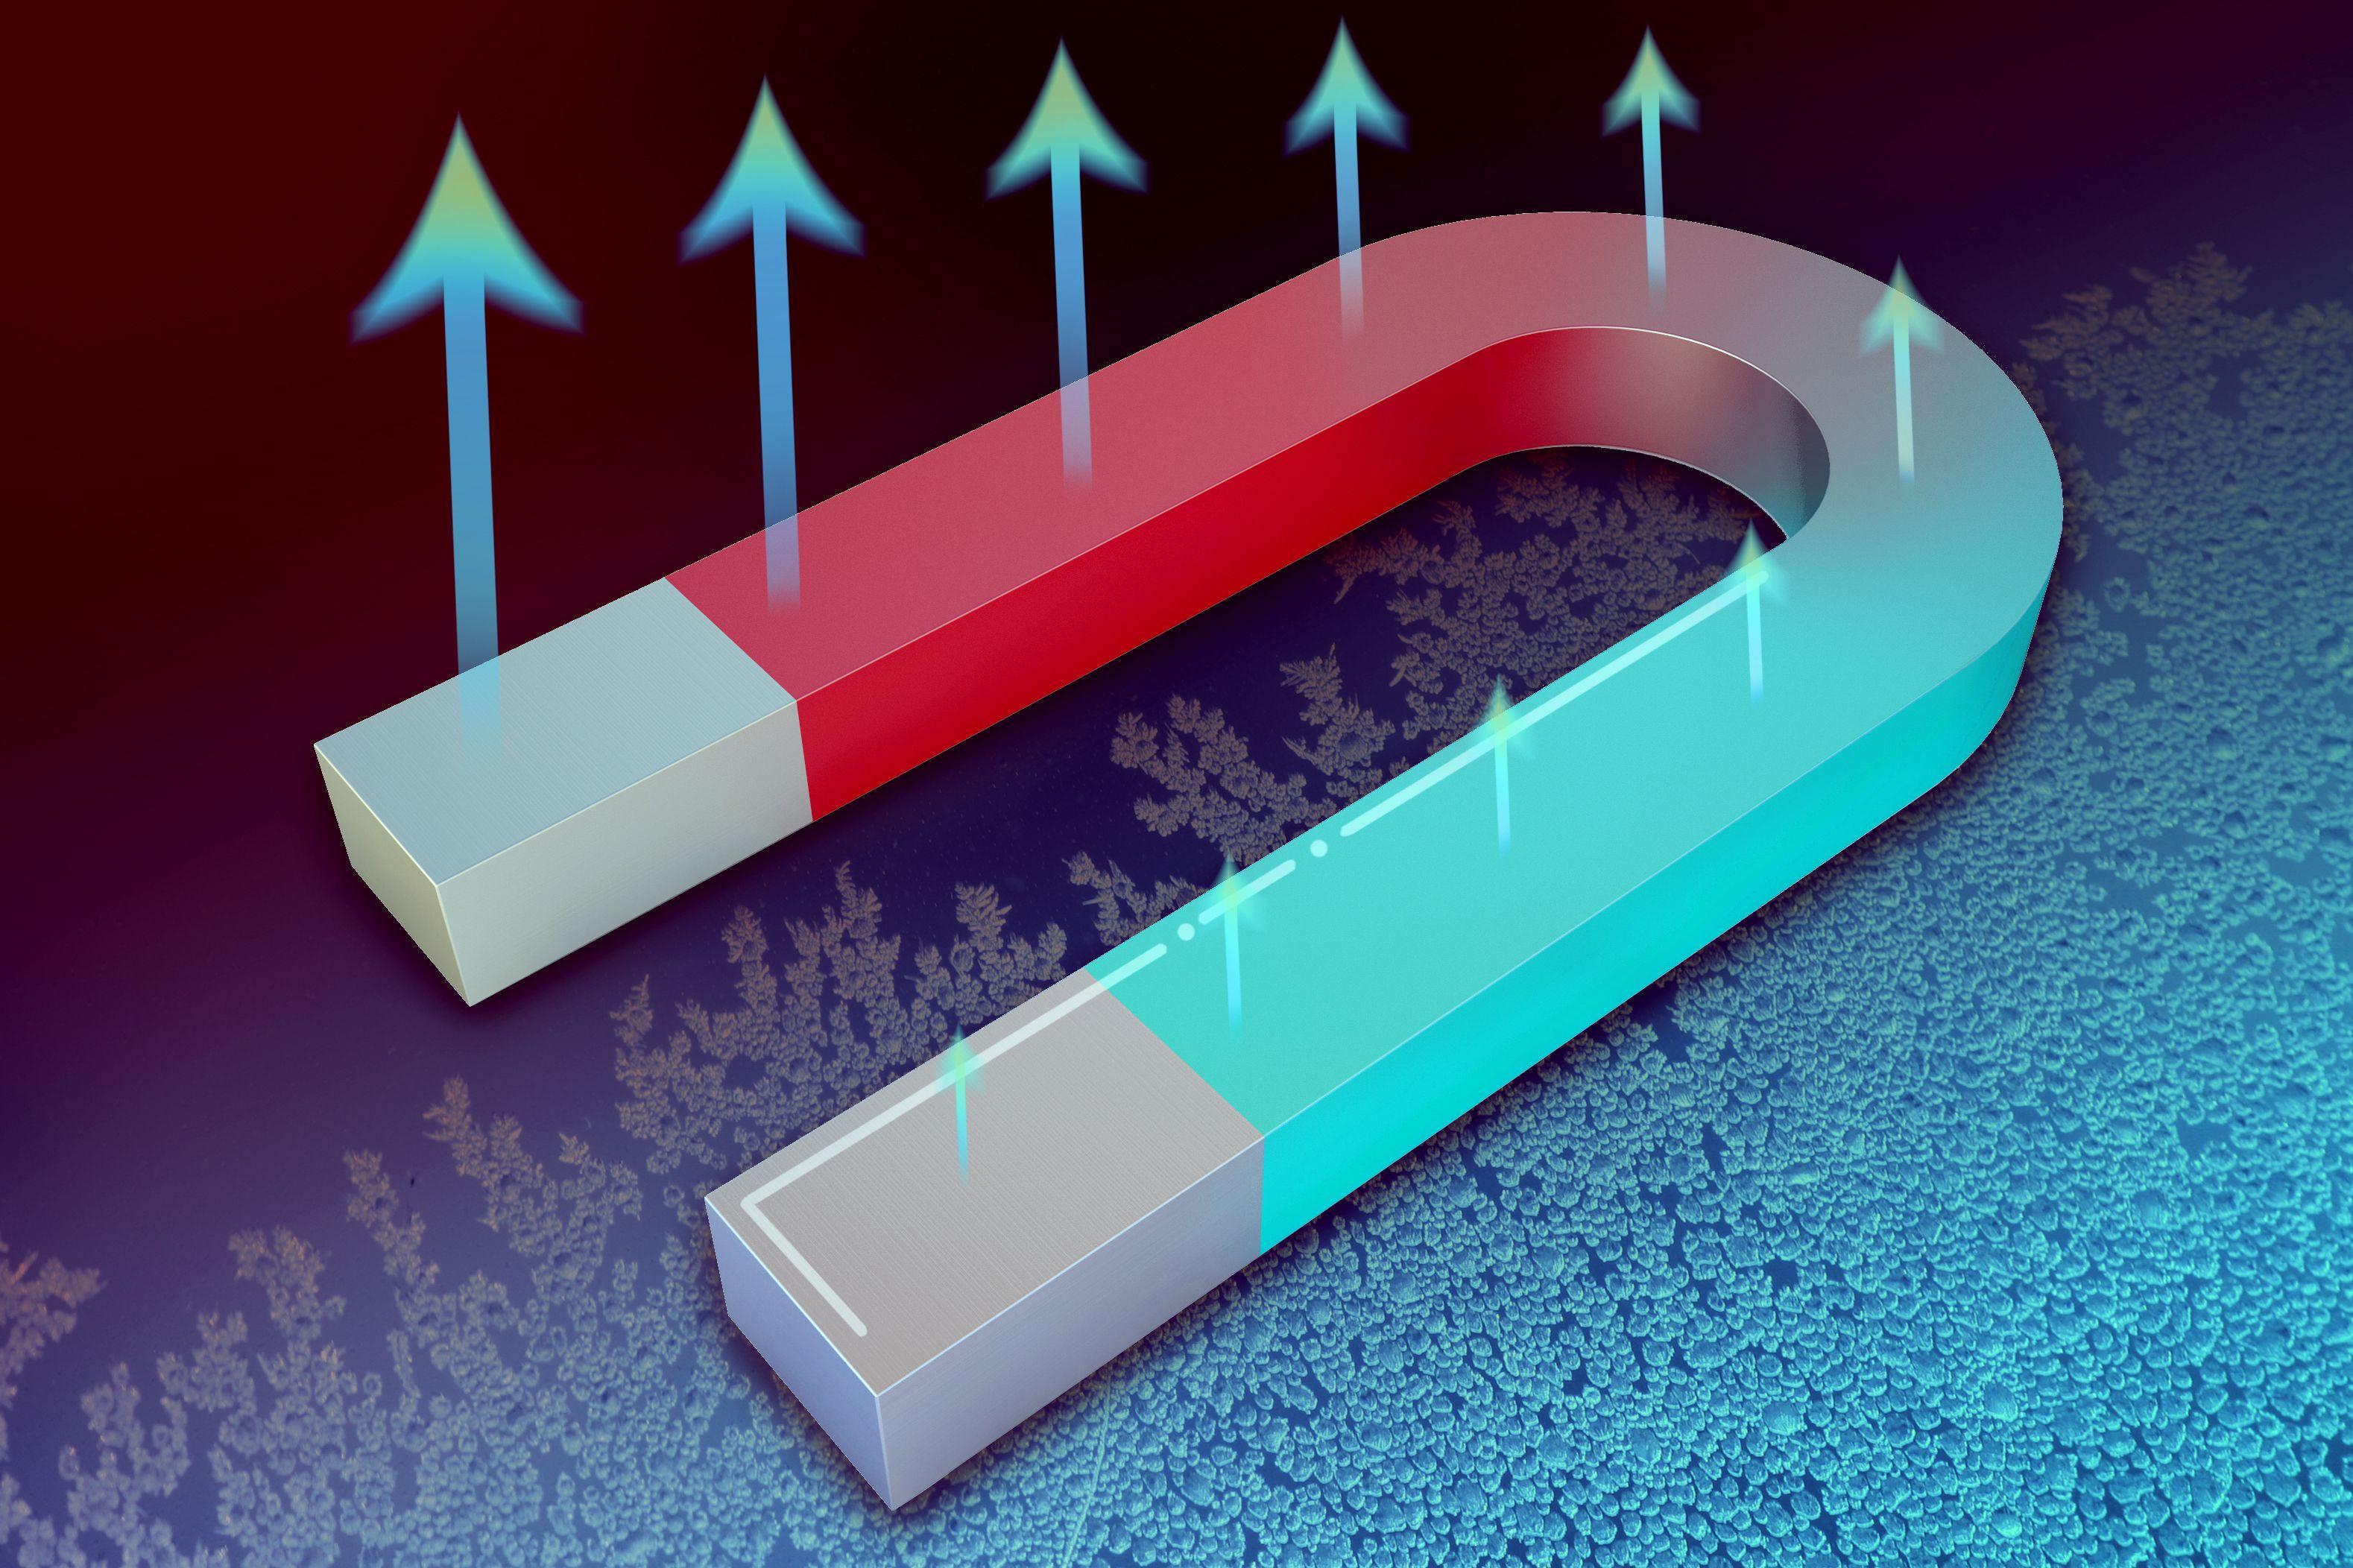 Refrigerator Magnets Mit News Massachusetts Institute Of Technology